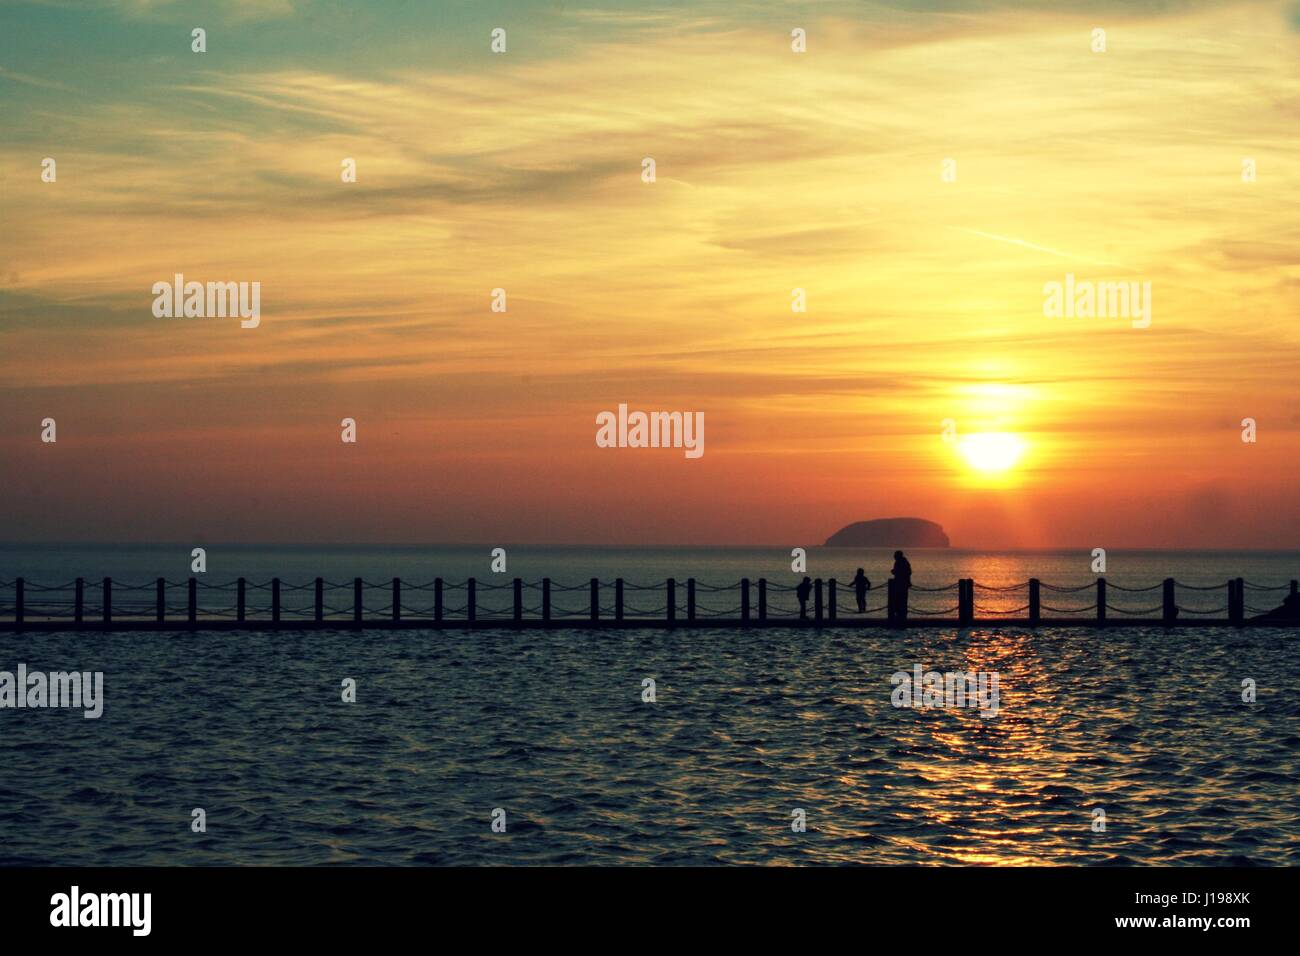 Sunset Sighting - Stock Image